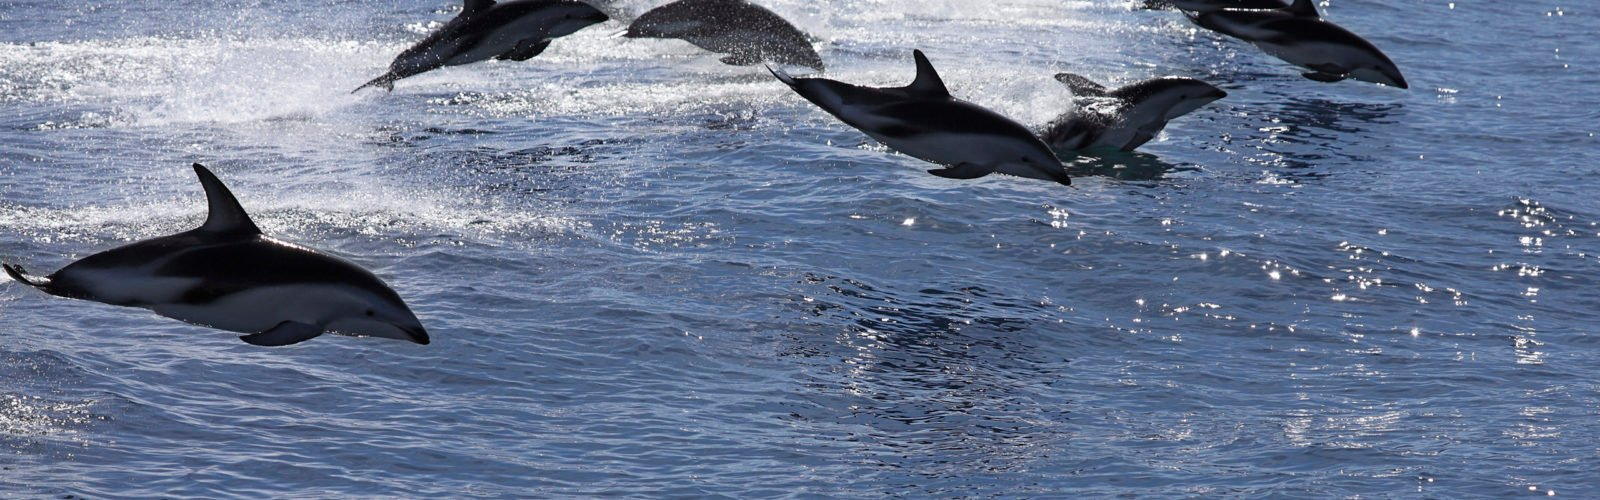 Pod of jumping dolphins, Kaikoura, New Zealand